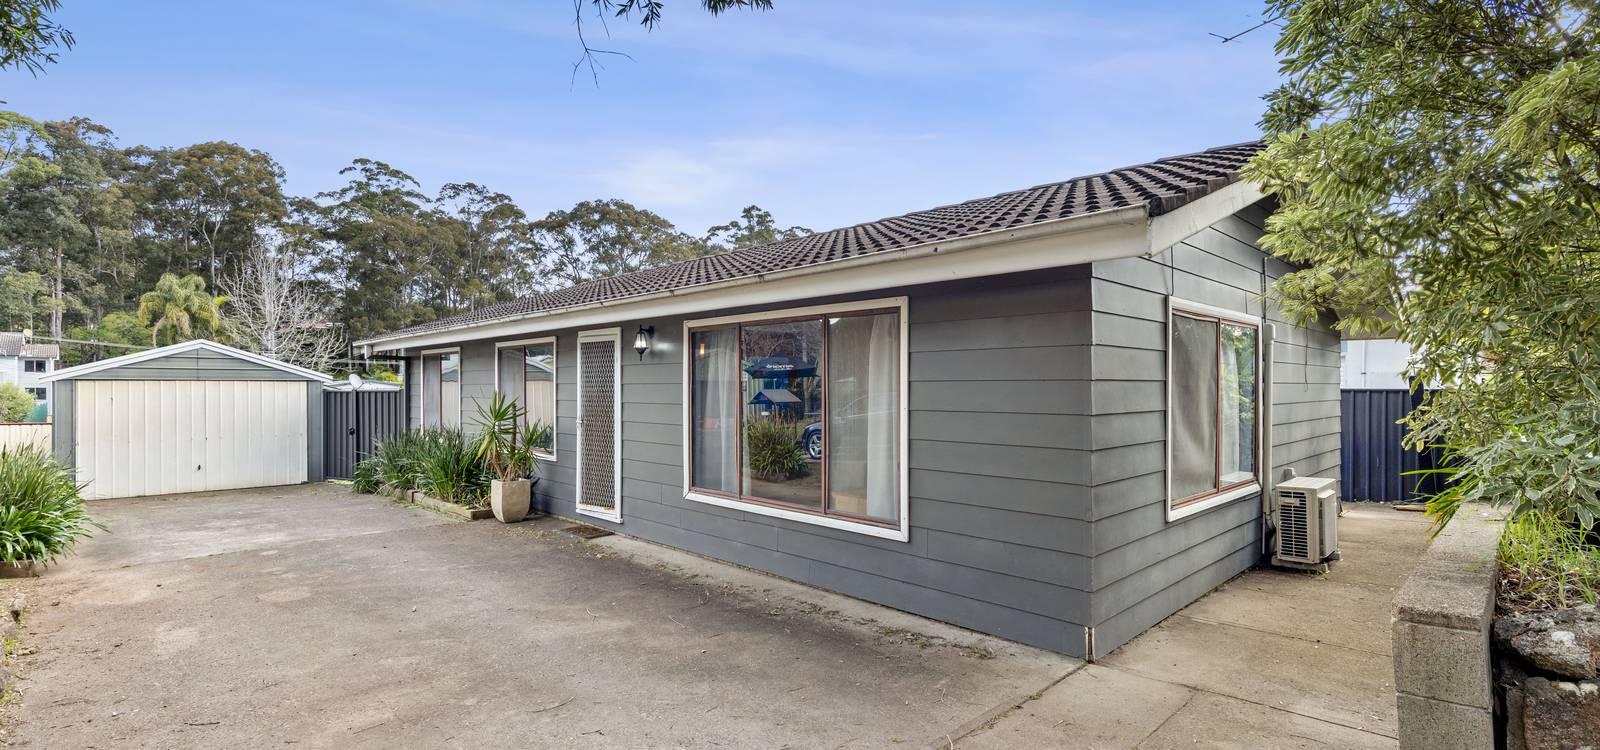 28 Clare Crescent BATEHAVEN, NSW 2536 - photo 1